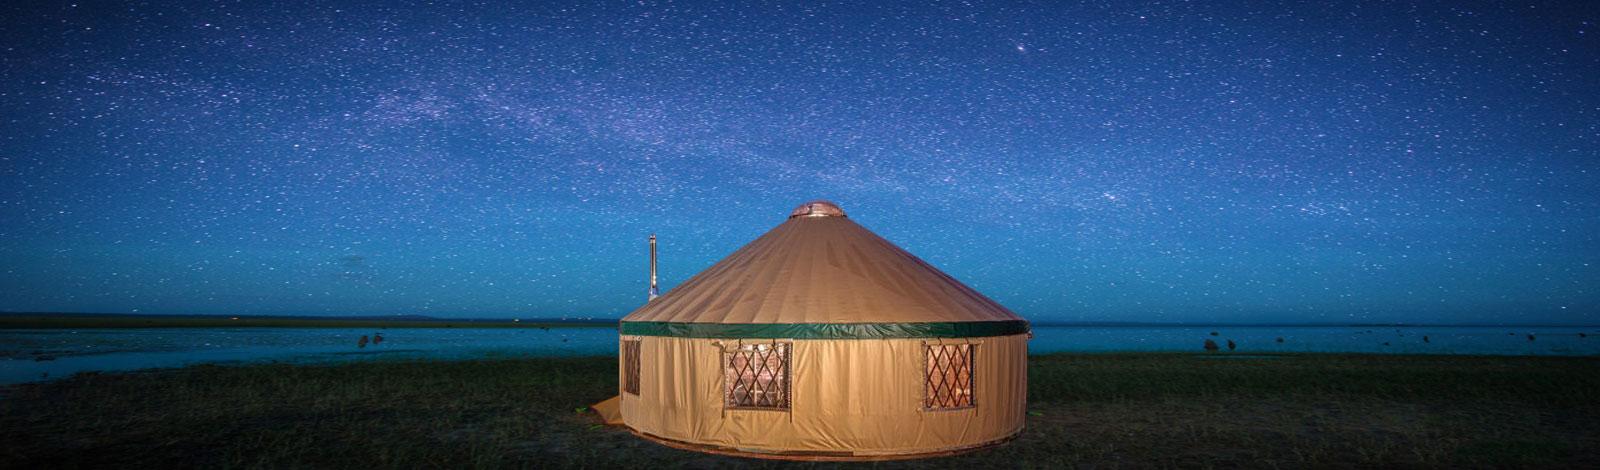 Best Glamping Destinations Yurt